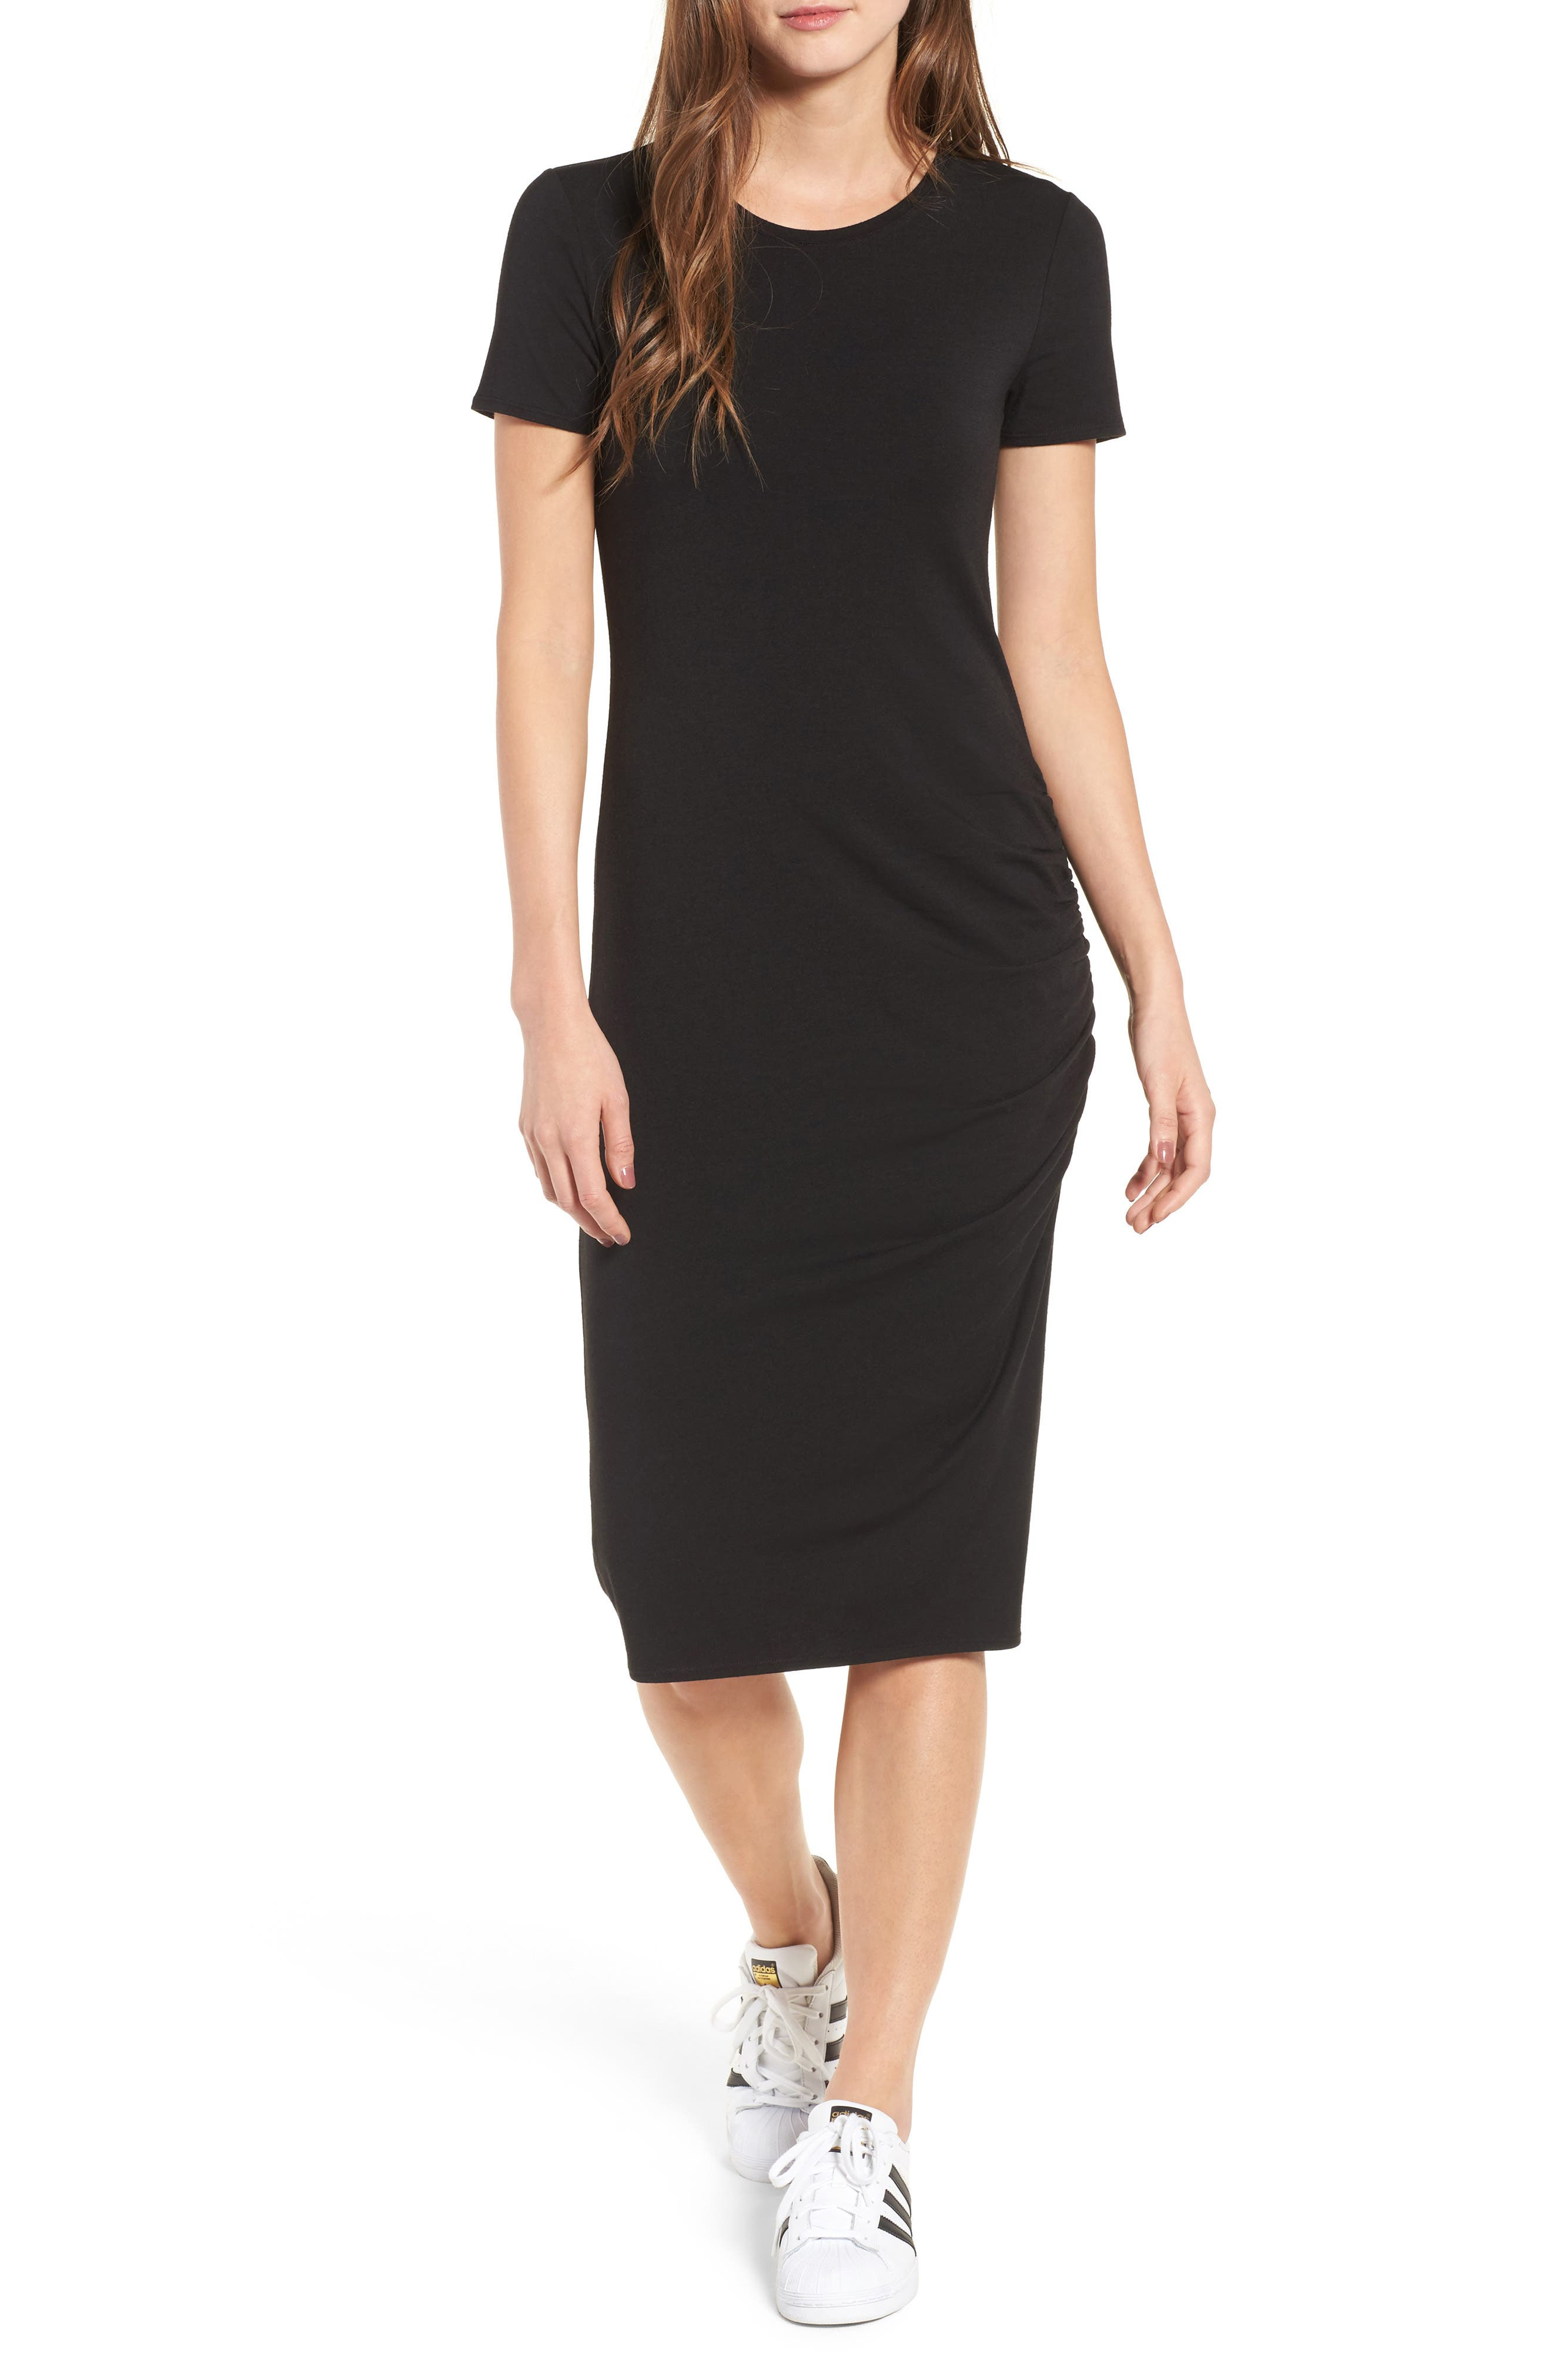 Treasure & Bond Side Ruched Body-Con Dress (Regular & Plus Size)